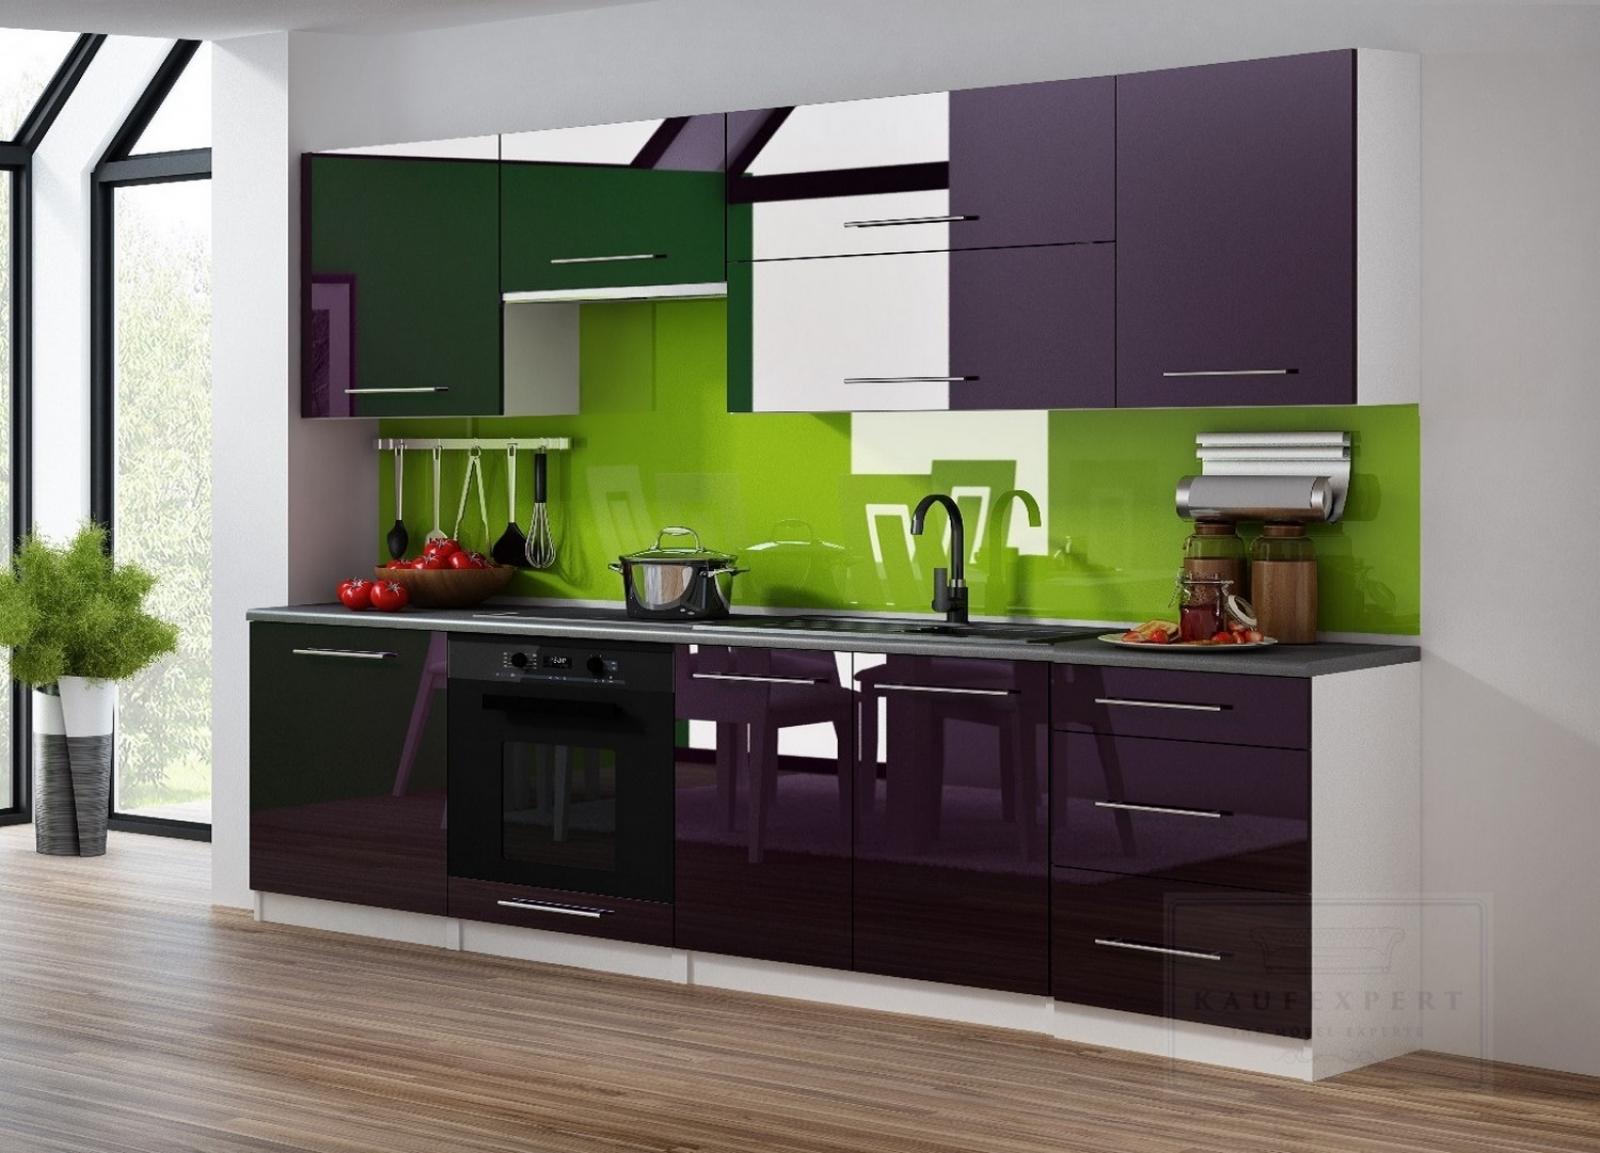 arbeitsplatte 240 x 80 px02 hitoiro. Black Bedroom Furniture Sets. Home Design Ideas